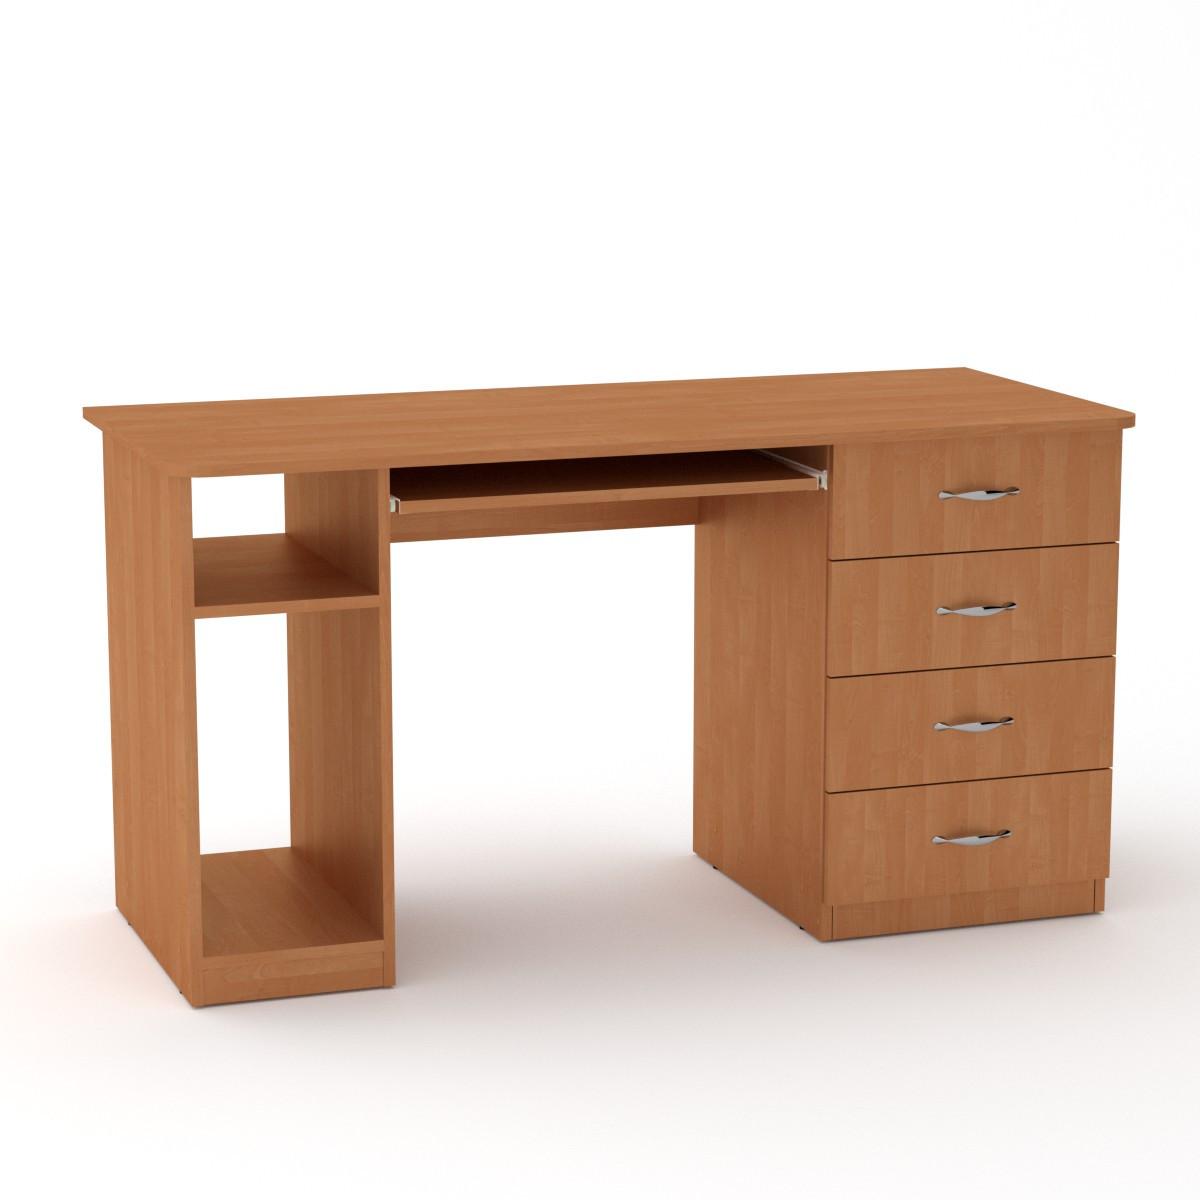 Стол компьютерный СКМ-11 ольха Компанит (140х60х74 см)